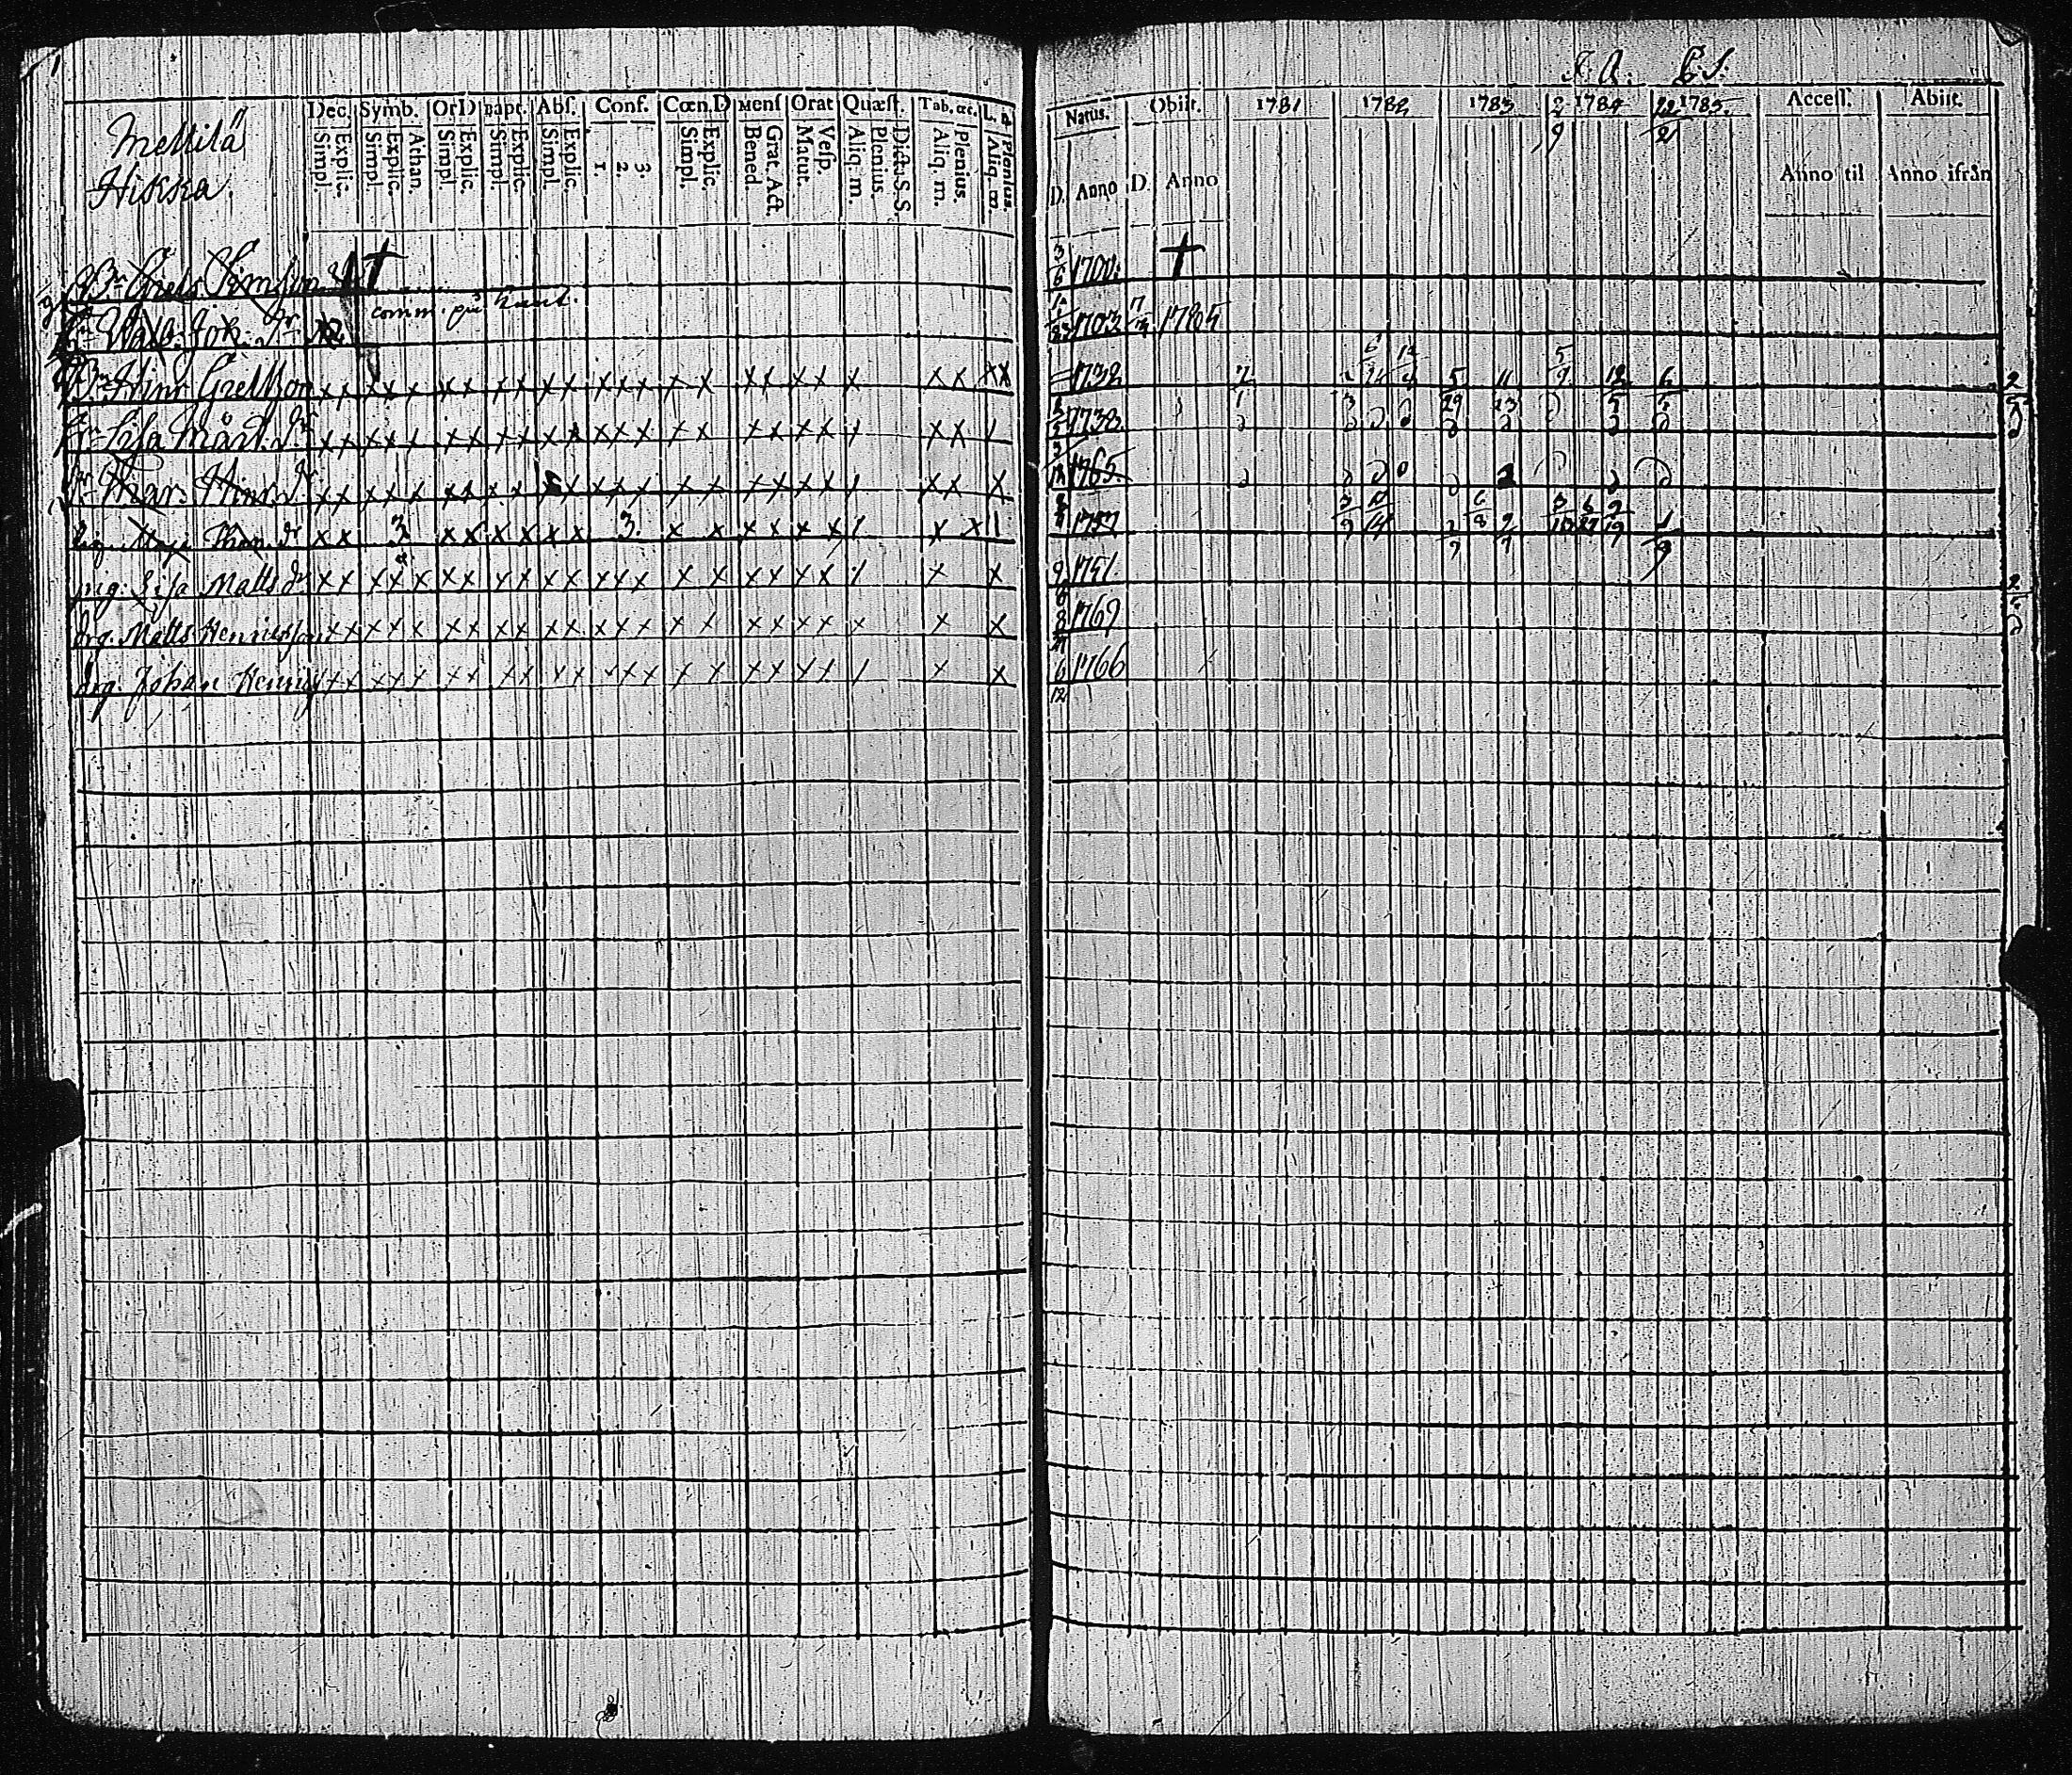 Sshy loimaa rippikirja 1781 1785 kuva 60 for 60 1785